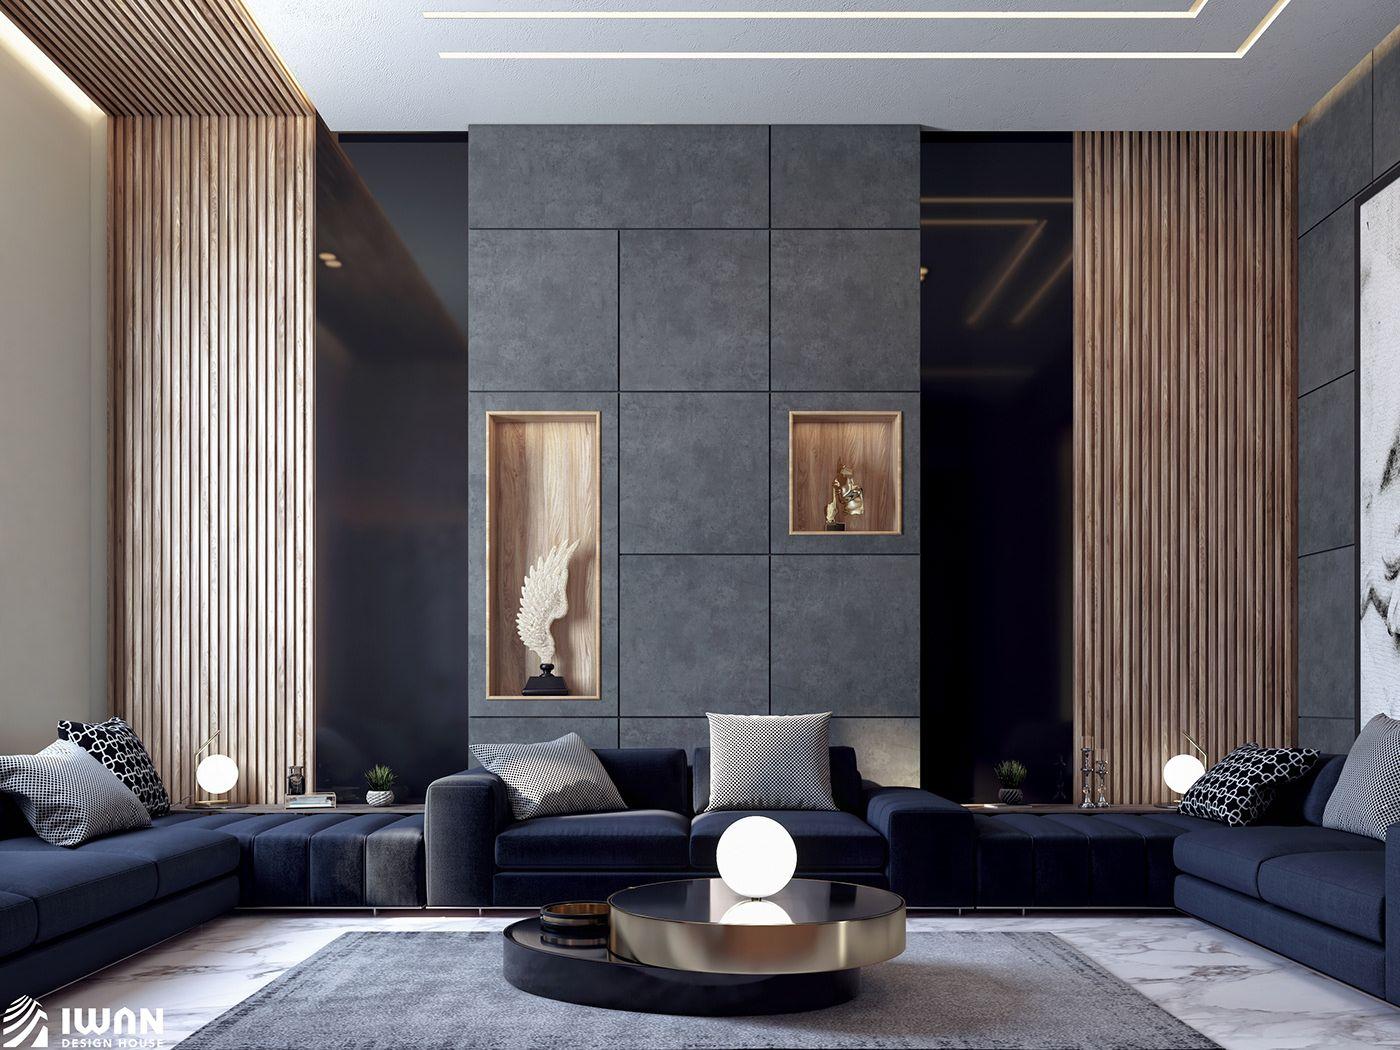 Behance Search Luxury Living Room Living Room Design Modern Living Room Sofa Design Interior home design living room and